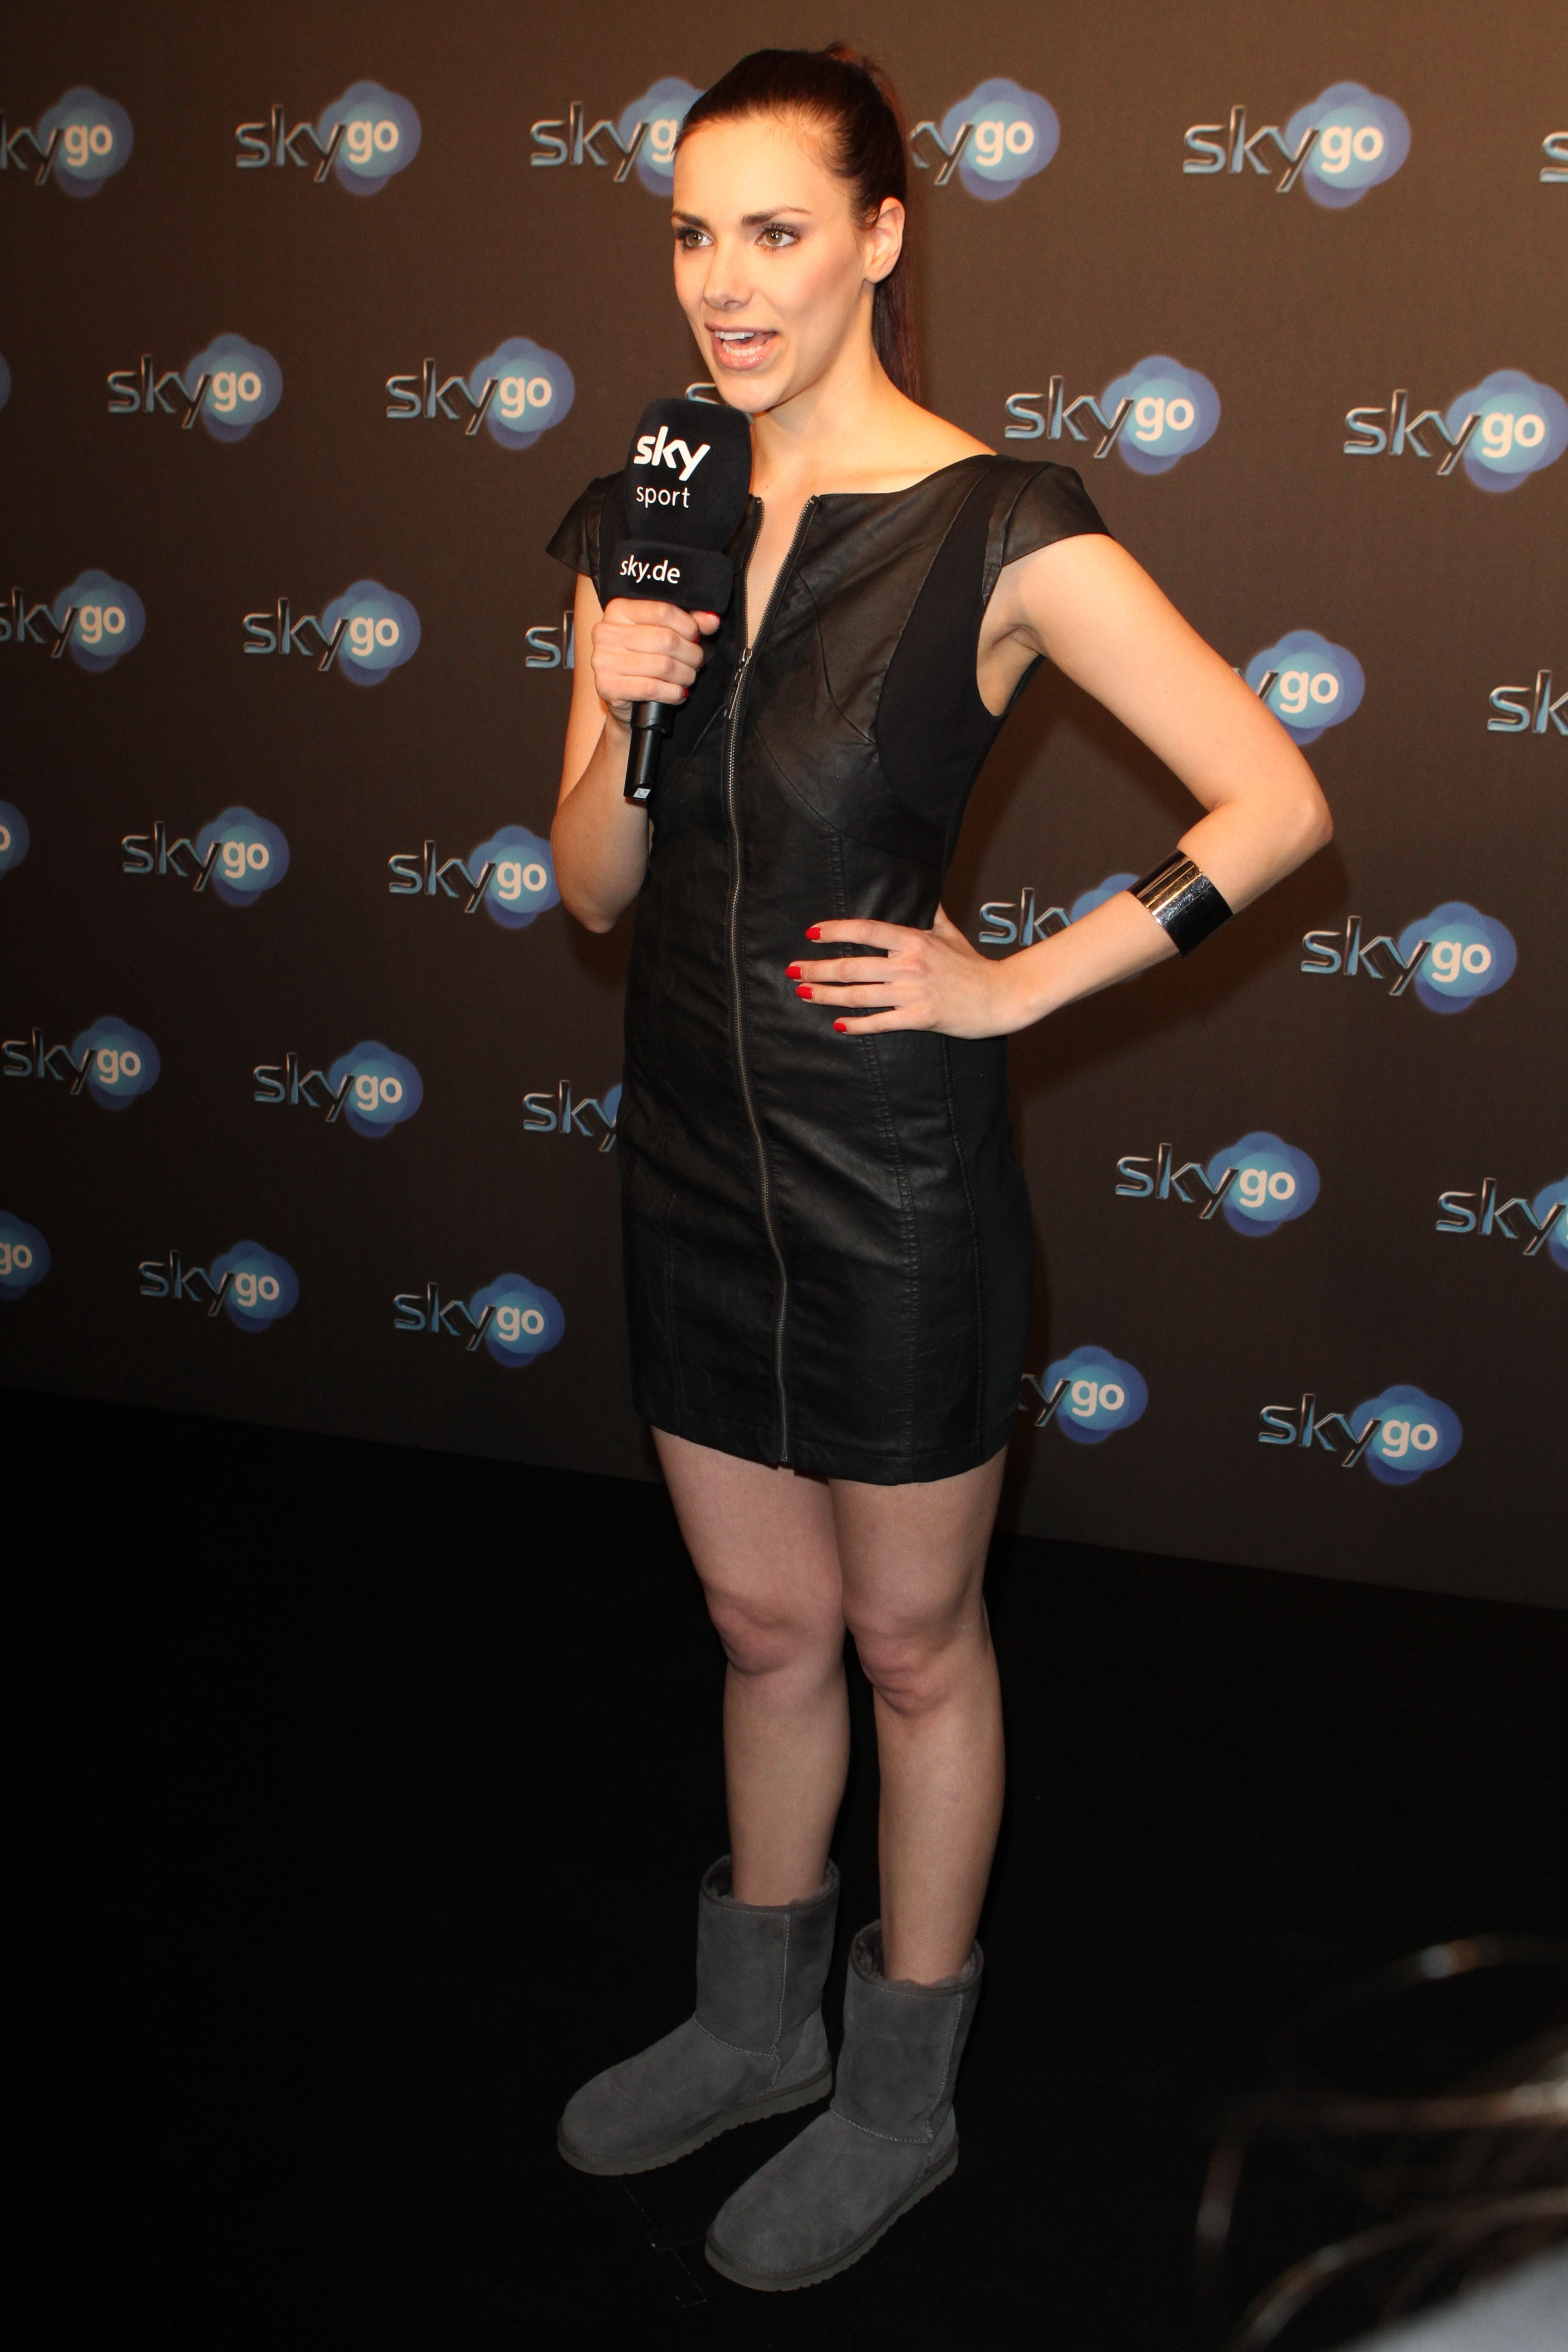 idol celebs com Esther Sedlaczek 110407 22